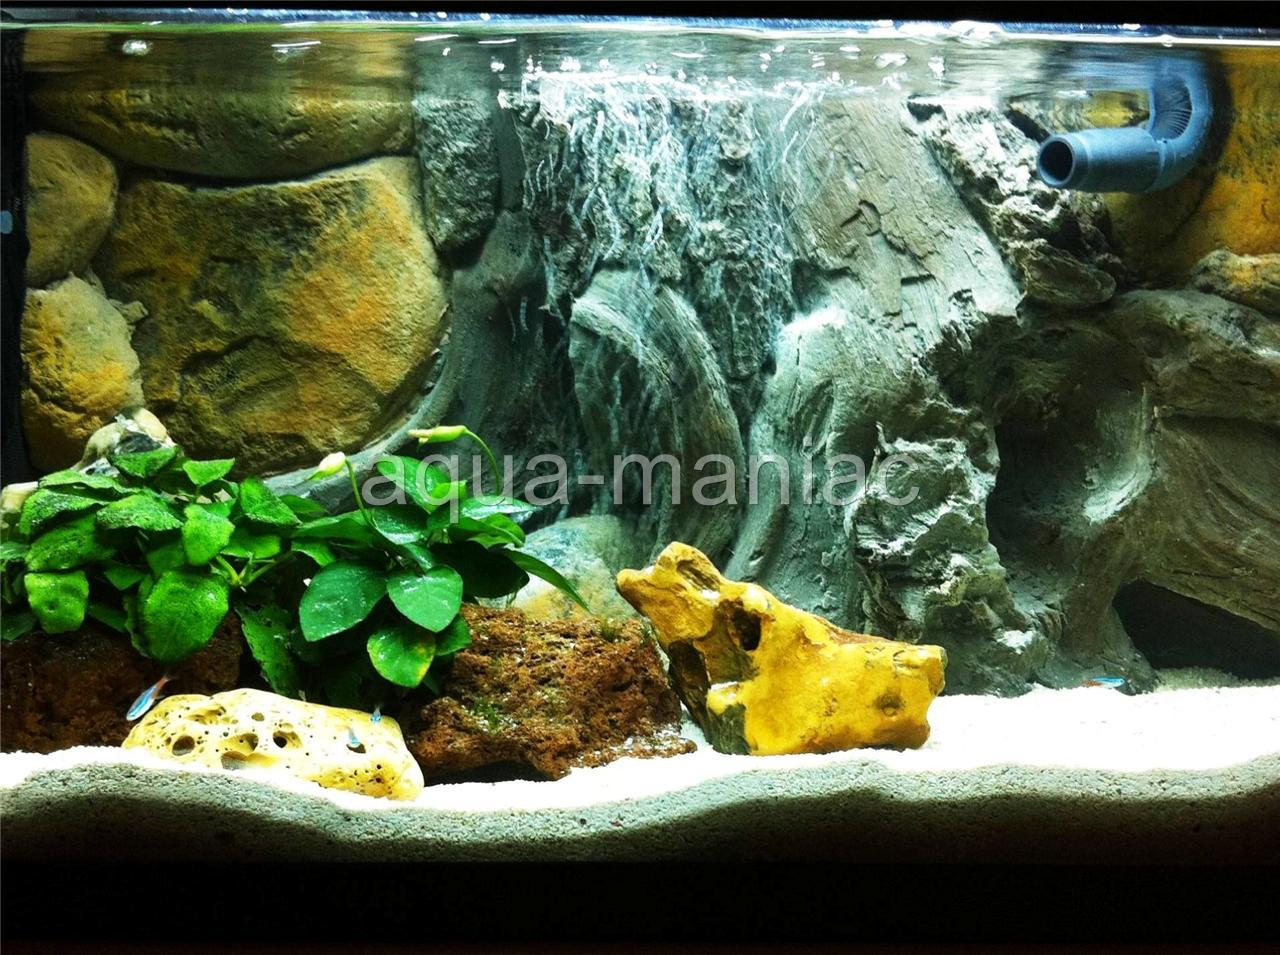 Aquarium backgrounds ebay uk aquarium backgrounds for for Fish tank backdrop